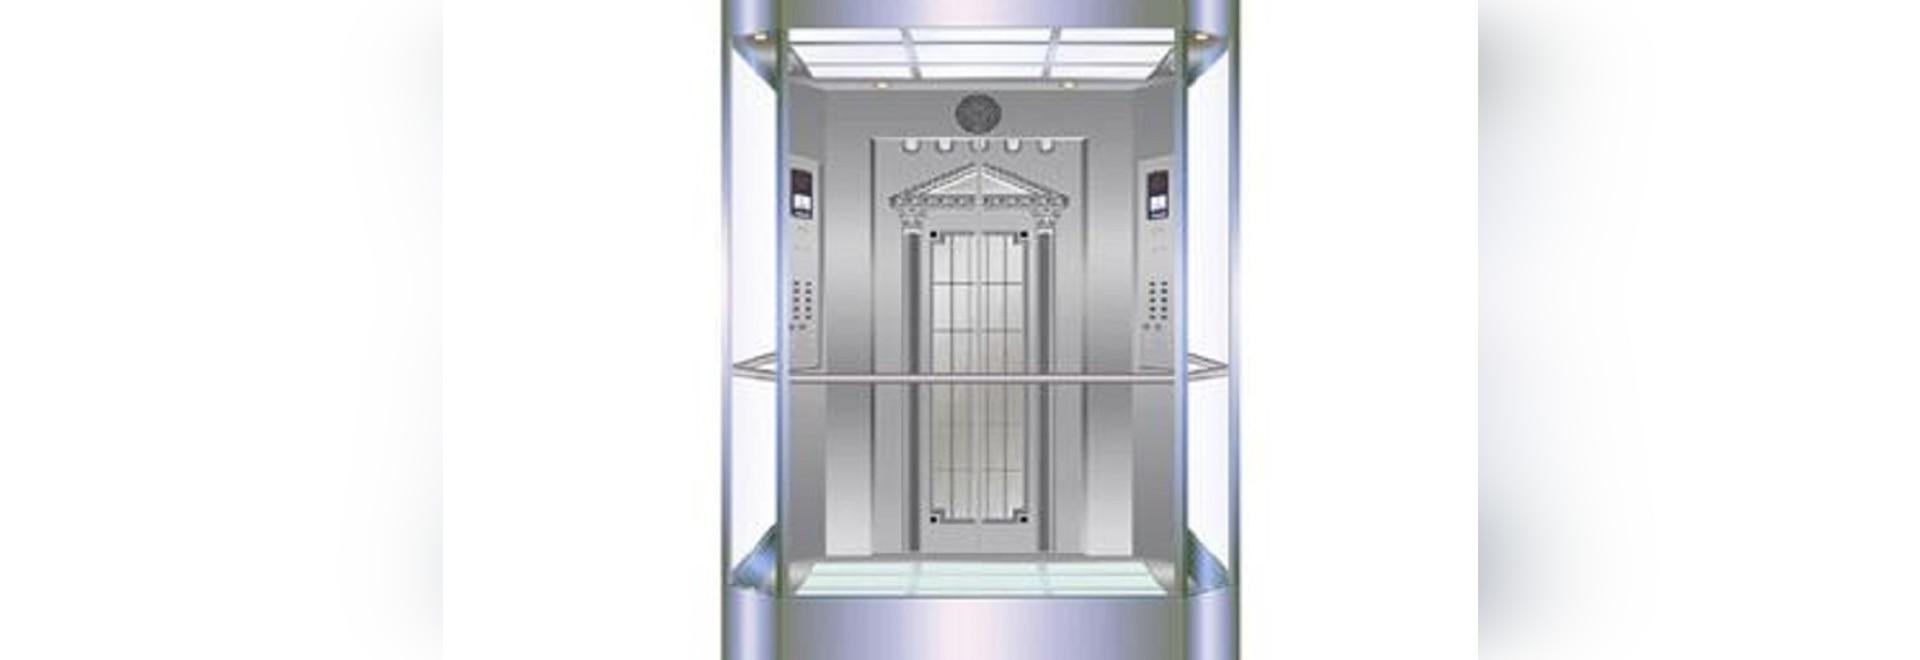 High quality elevator created by HGLaser cutting machine